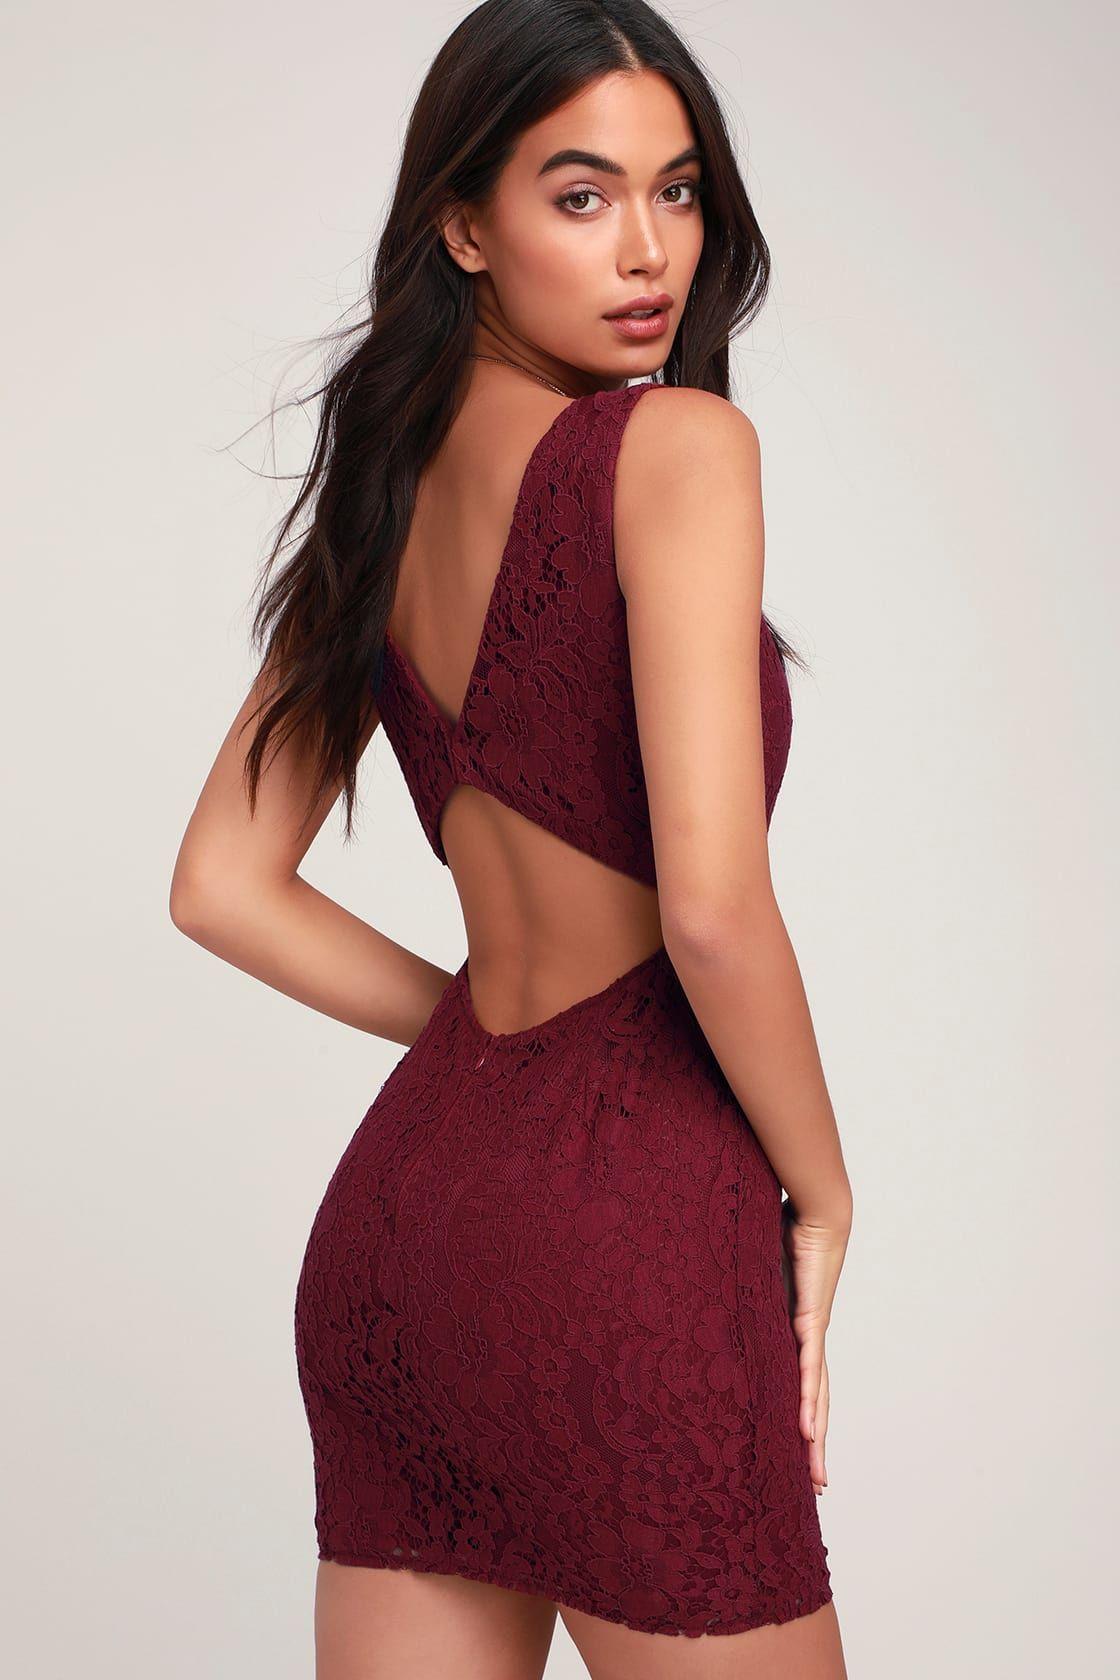 Nevaeh Burgundy Lace Cutout Mini Dress Cute Lace Dresses Burgundy Mini Dress Long Sleeve Shift Dress